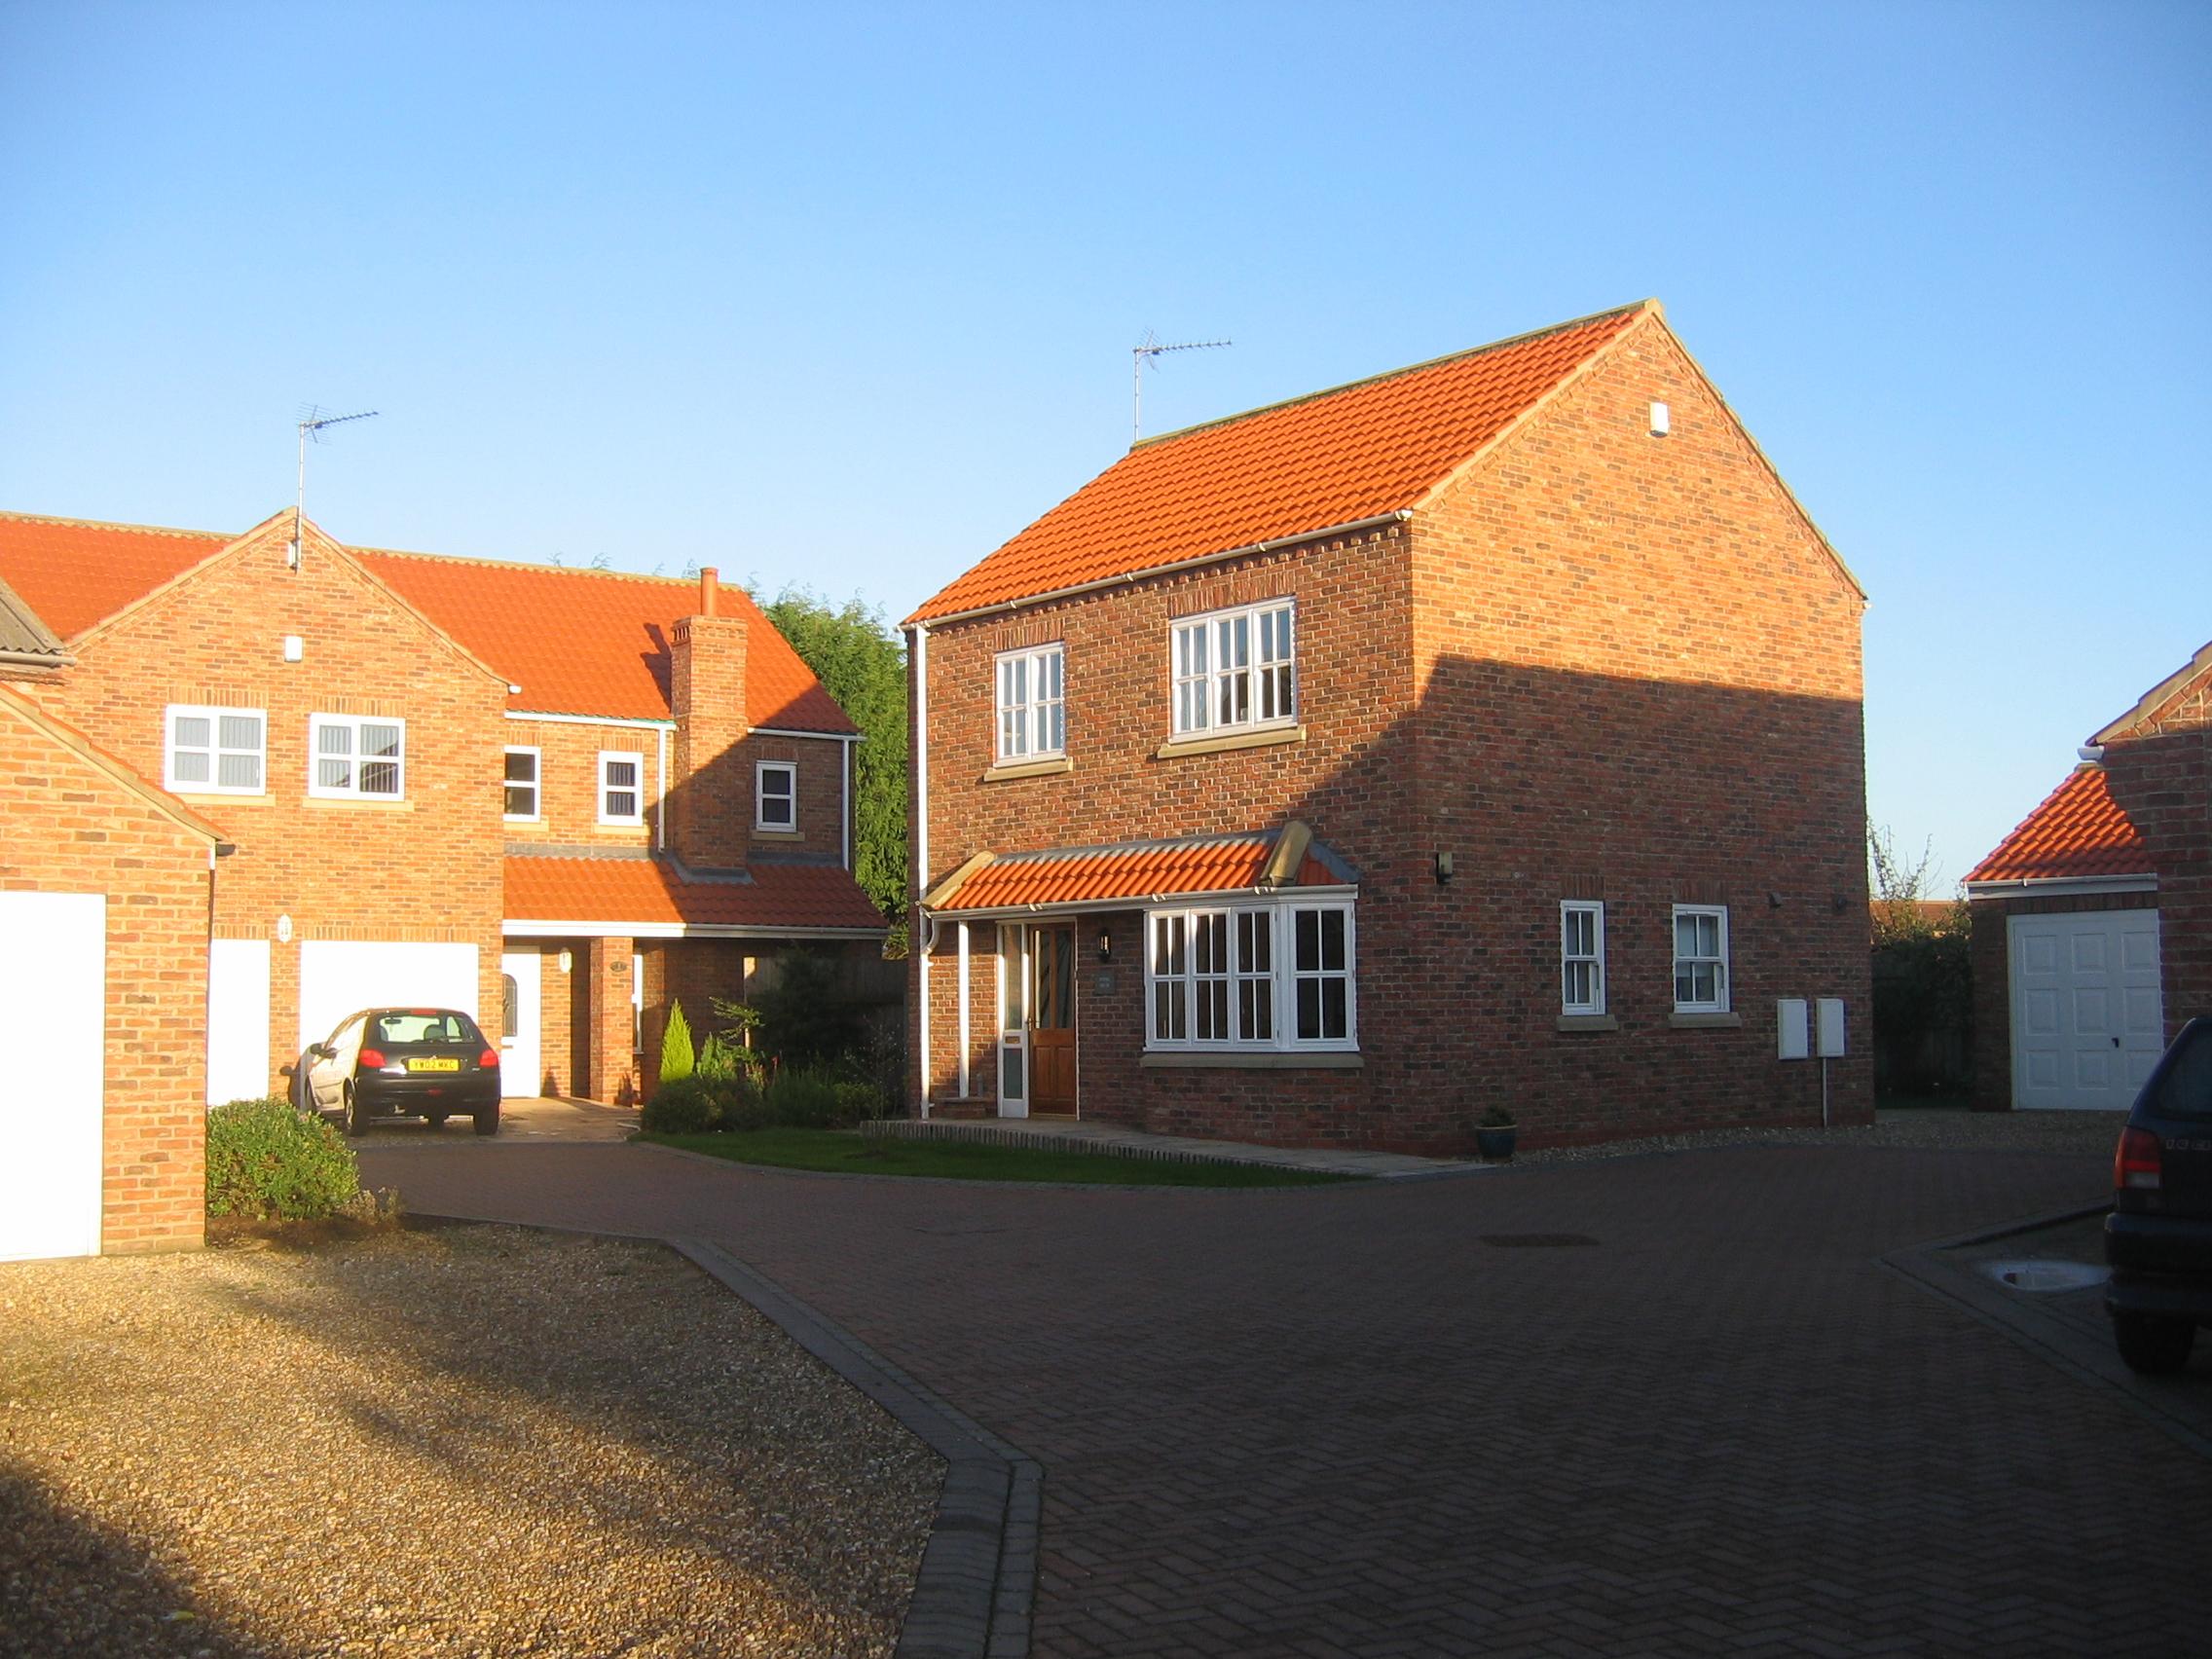 Blenheim Cottage - Beverley Architects - Samuel Kendall Associates.JPG